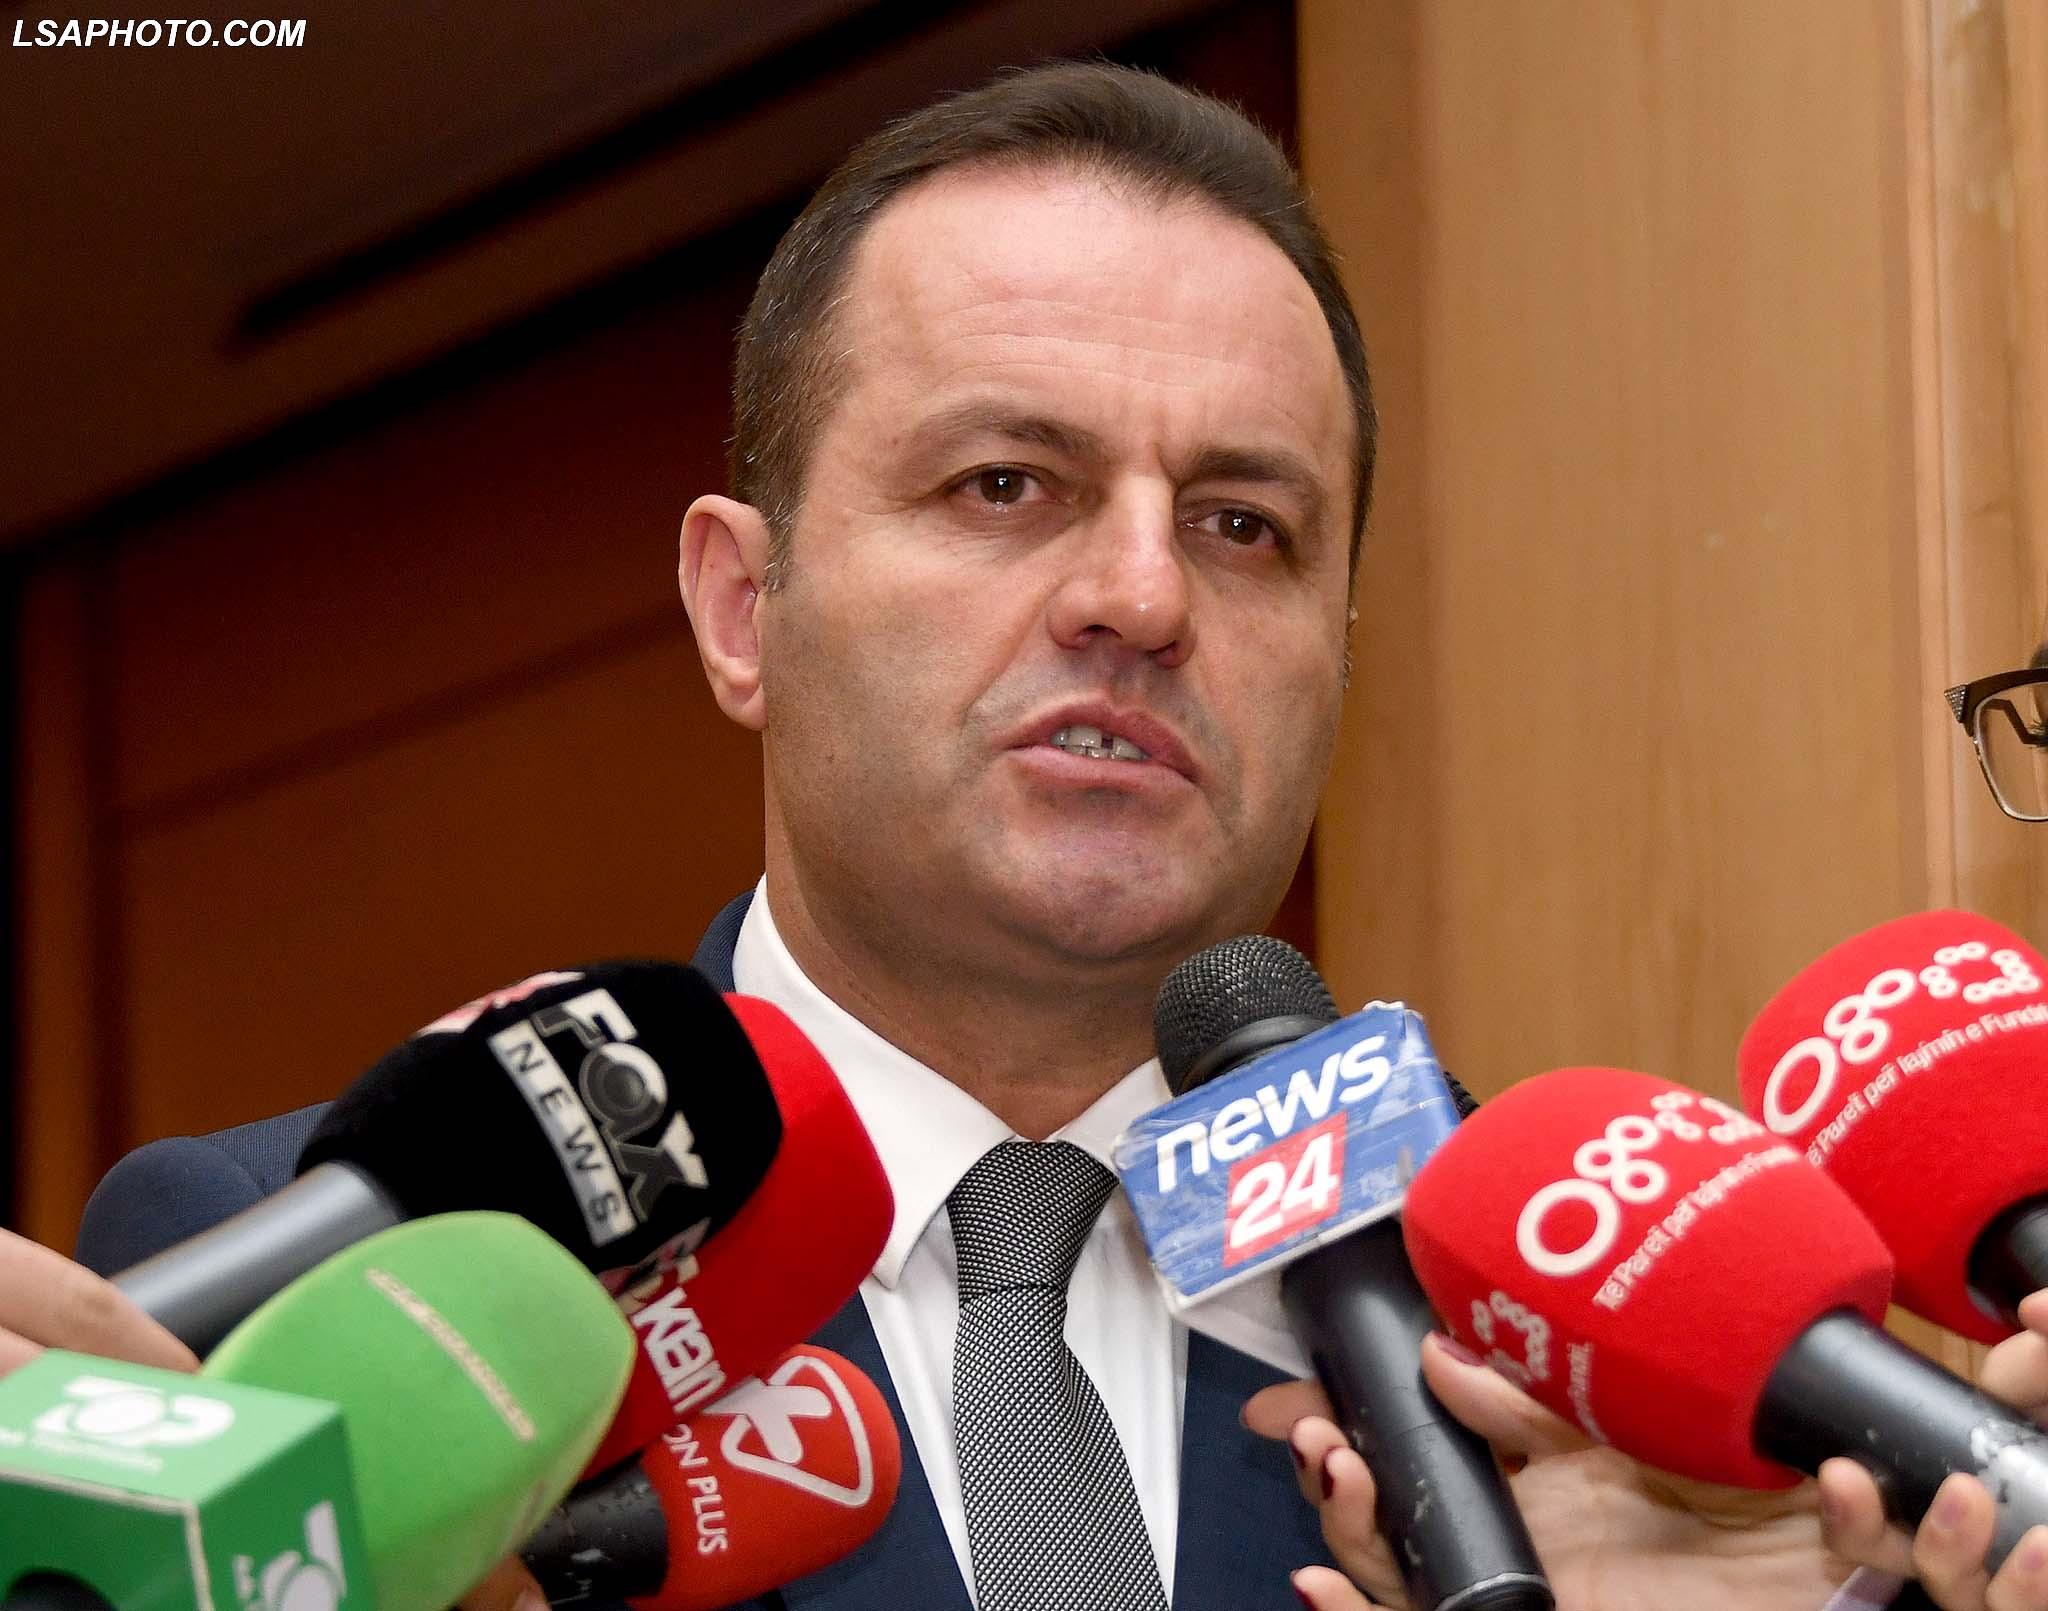 LLALLA FLET PER GAZETARET - Prokurori i Pergjithshem, Adriatik Llalla, duke folur per gazetaret pas nje seminari per luften ndaj narkotikeve, ku tha se askush nuk mund te nderhyje ne punen e prokurorit. /r/n/r/nLLALLA SPEAKS FOR THE REPORTERS - General Prosecutor Adriatik Llalla, speaks for the reporters, where he said that politics should no interfere in the prosecutor's work.